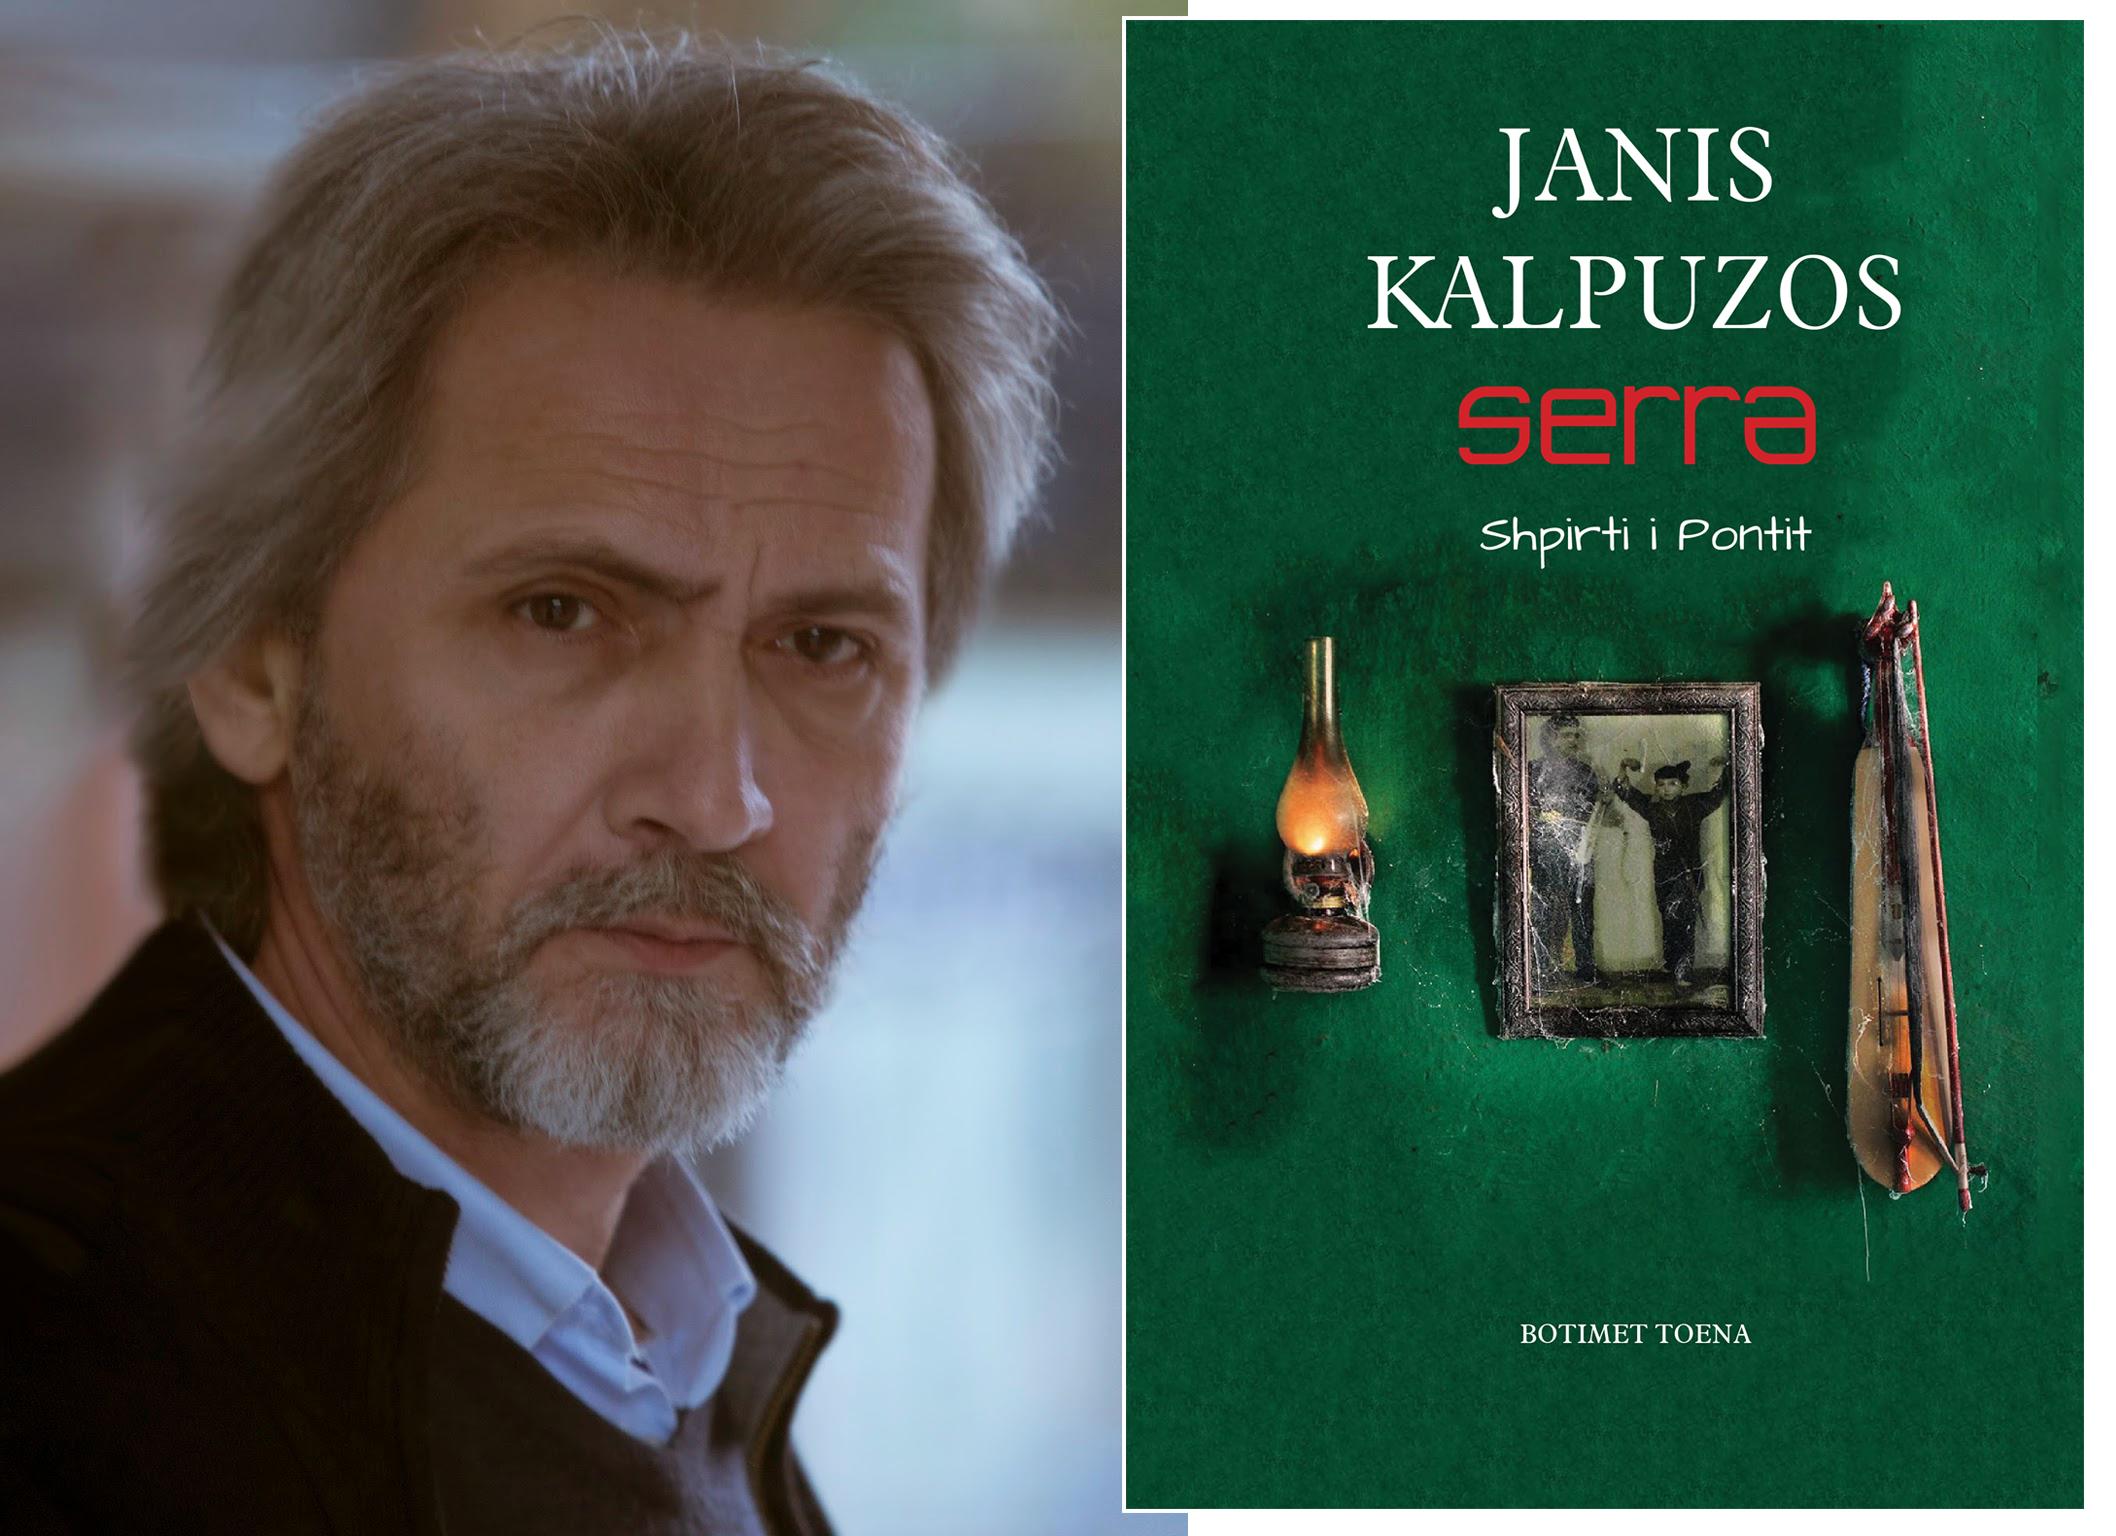 sasaKalpuzos-portret